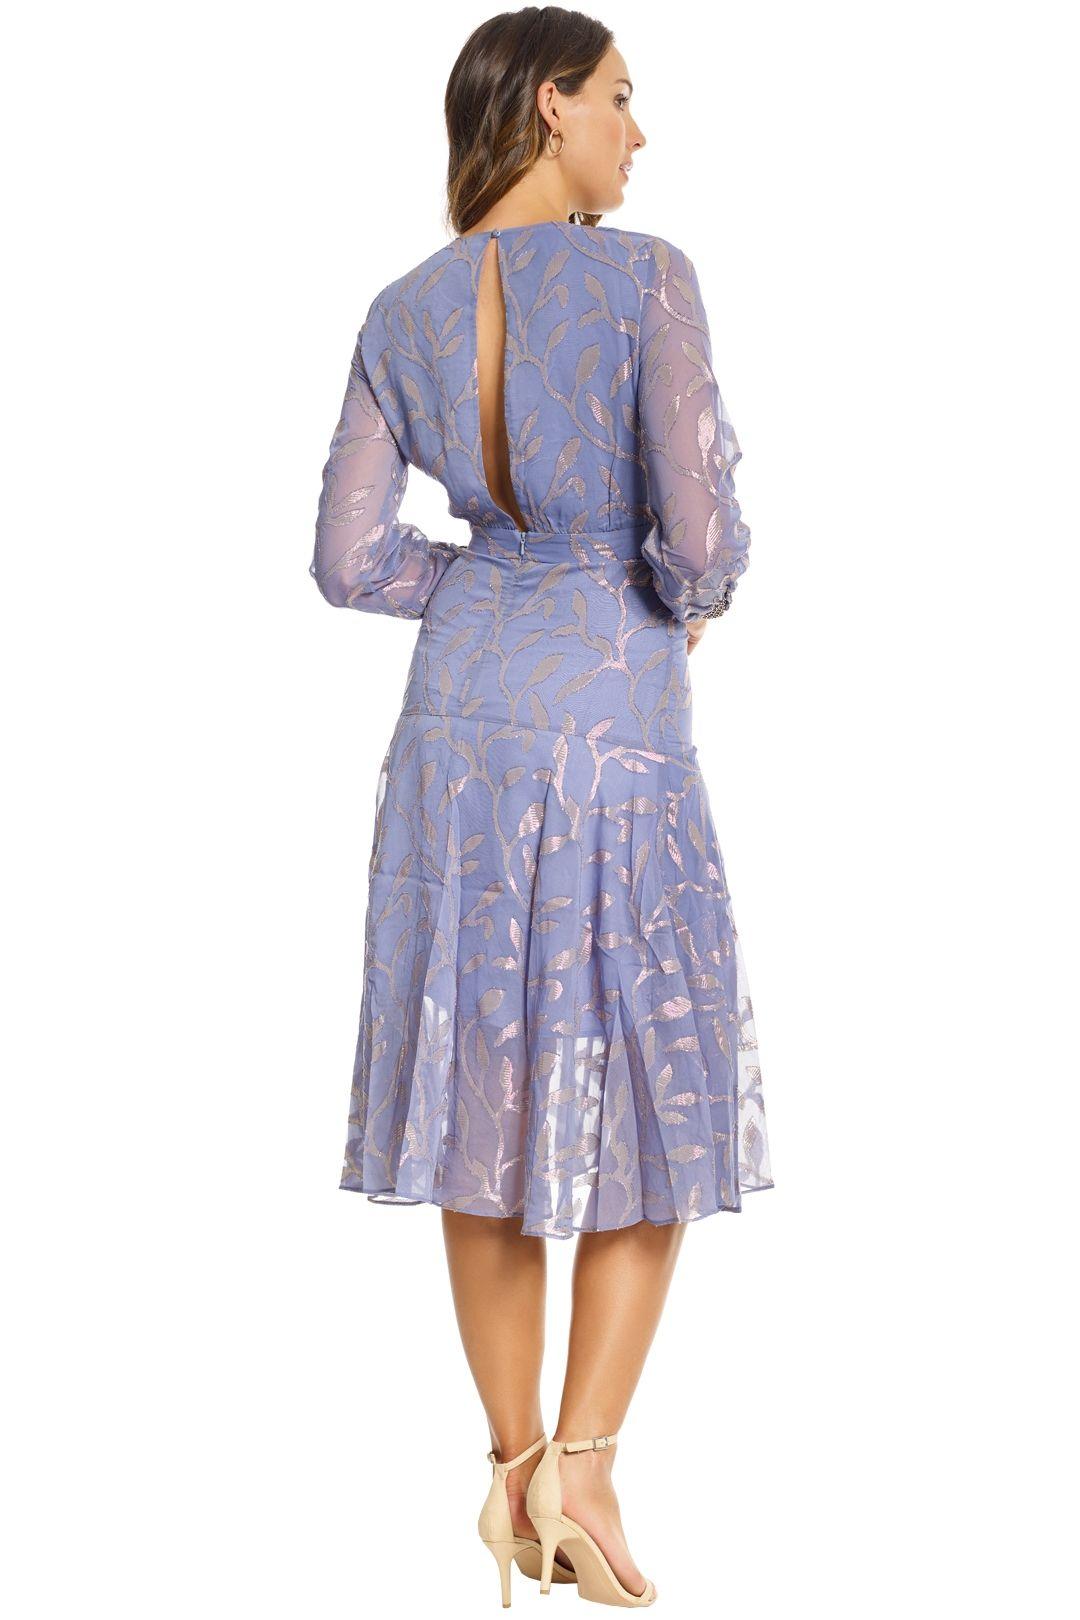 We Are Kindred - Luella Leaf Dress - Steele - Back